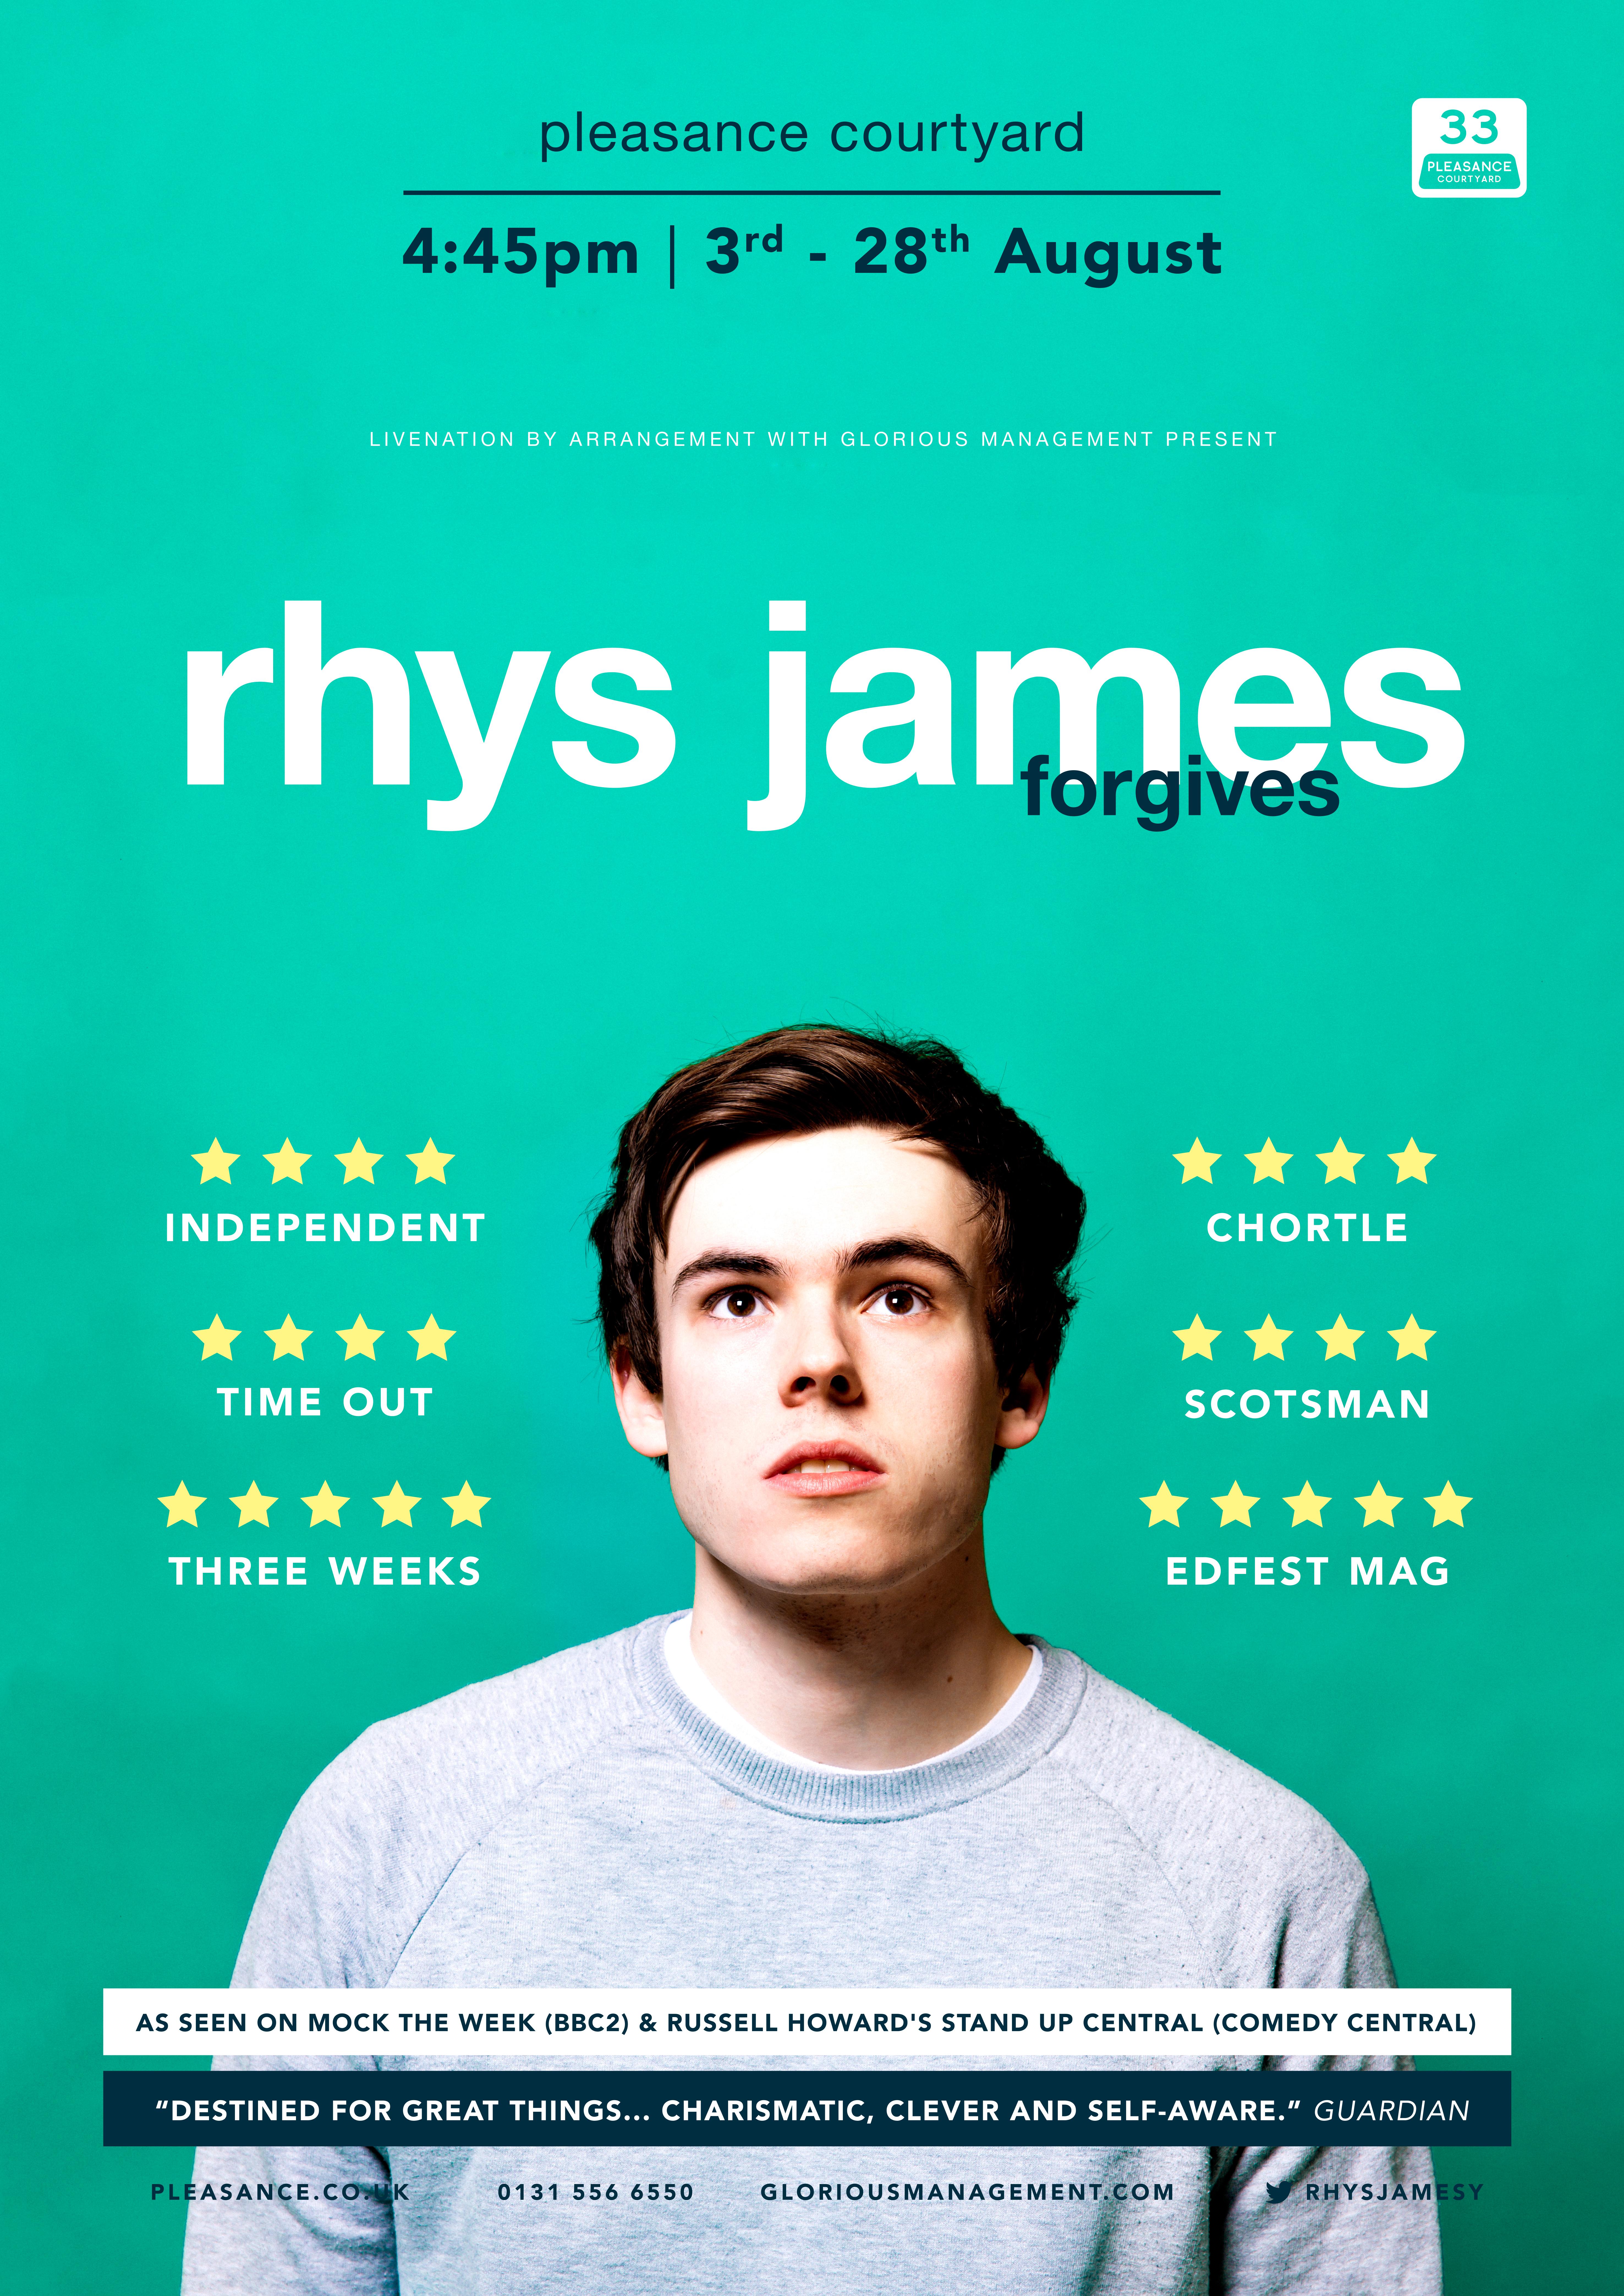 x_RhysJames_Forgives_HiRes ed2016